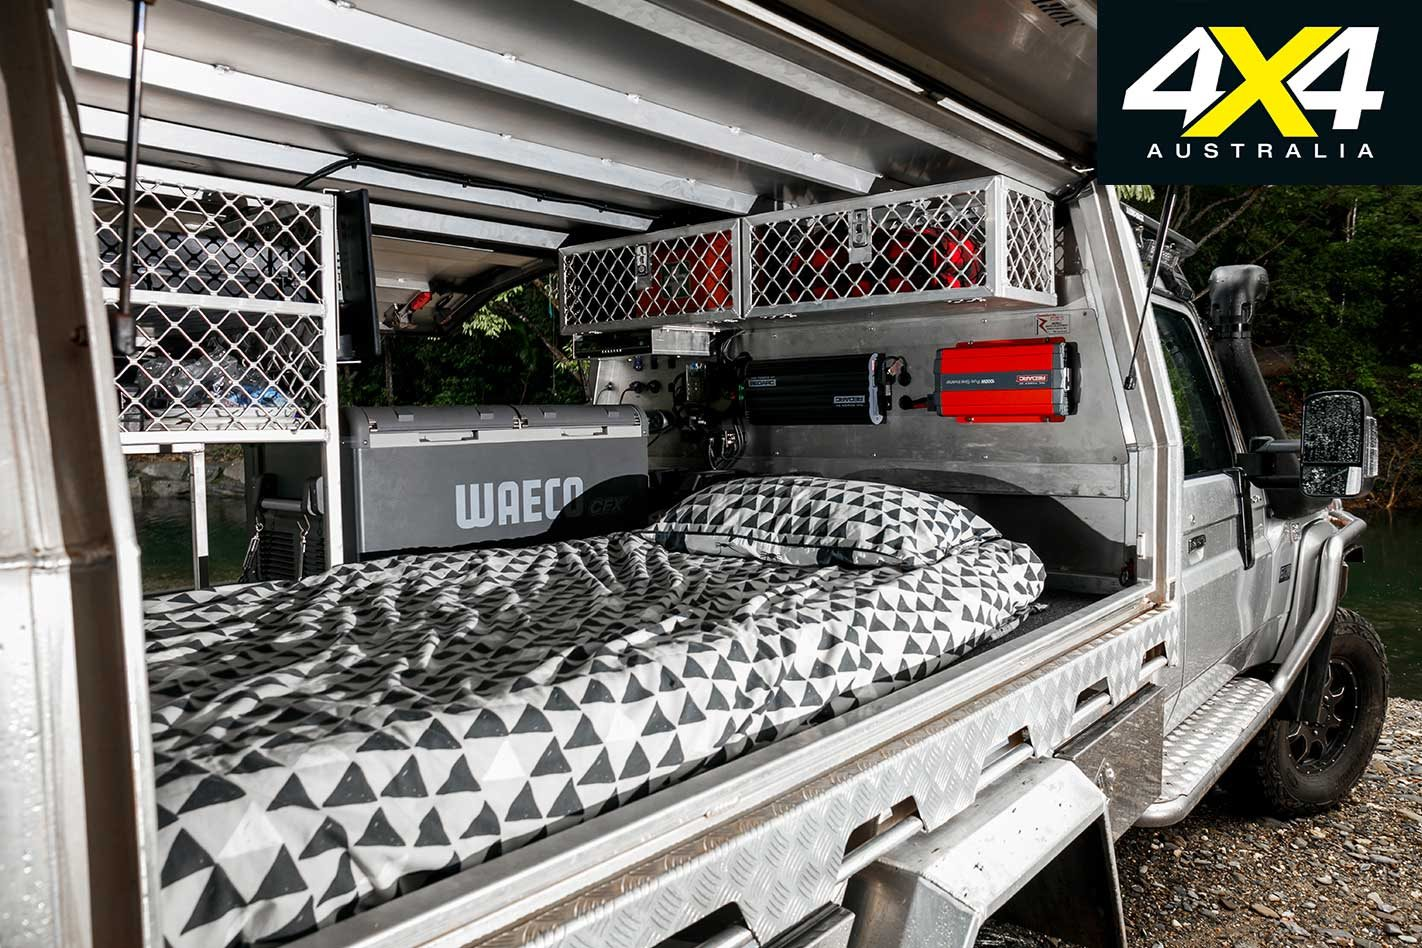 Custom portal-axled Toyota Land Cruiser 79 ute review